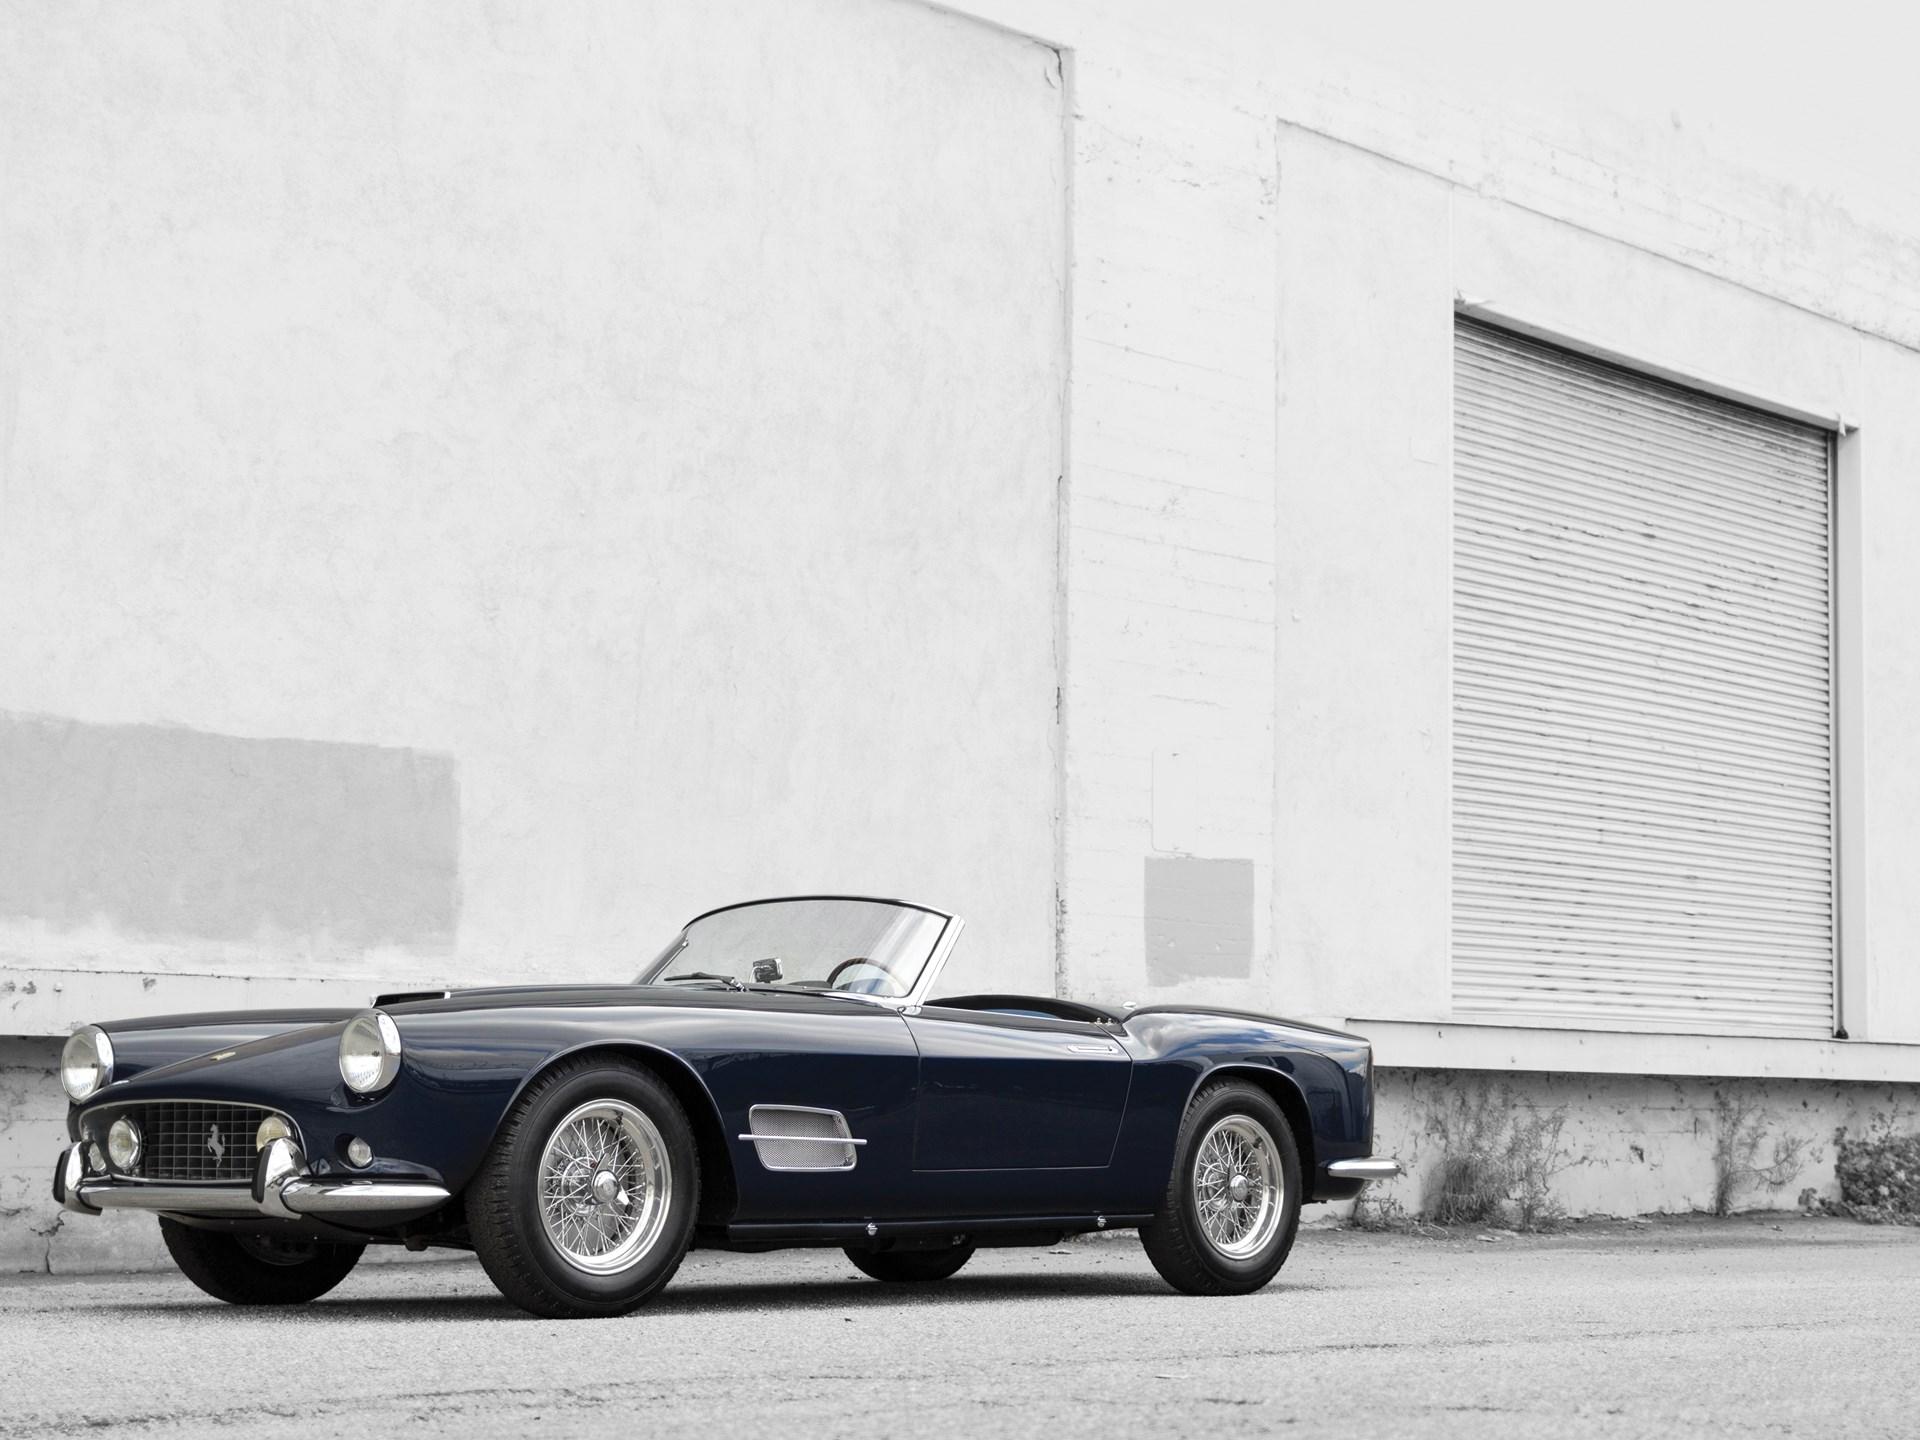 1959 Ferrari 250 GT LWB California Spider by Scaglietti